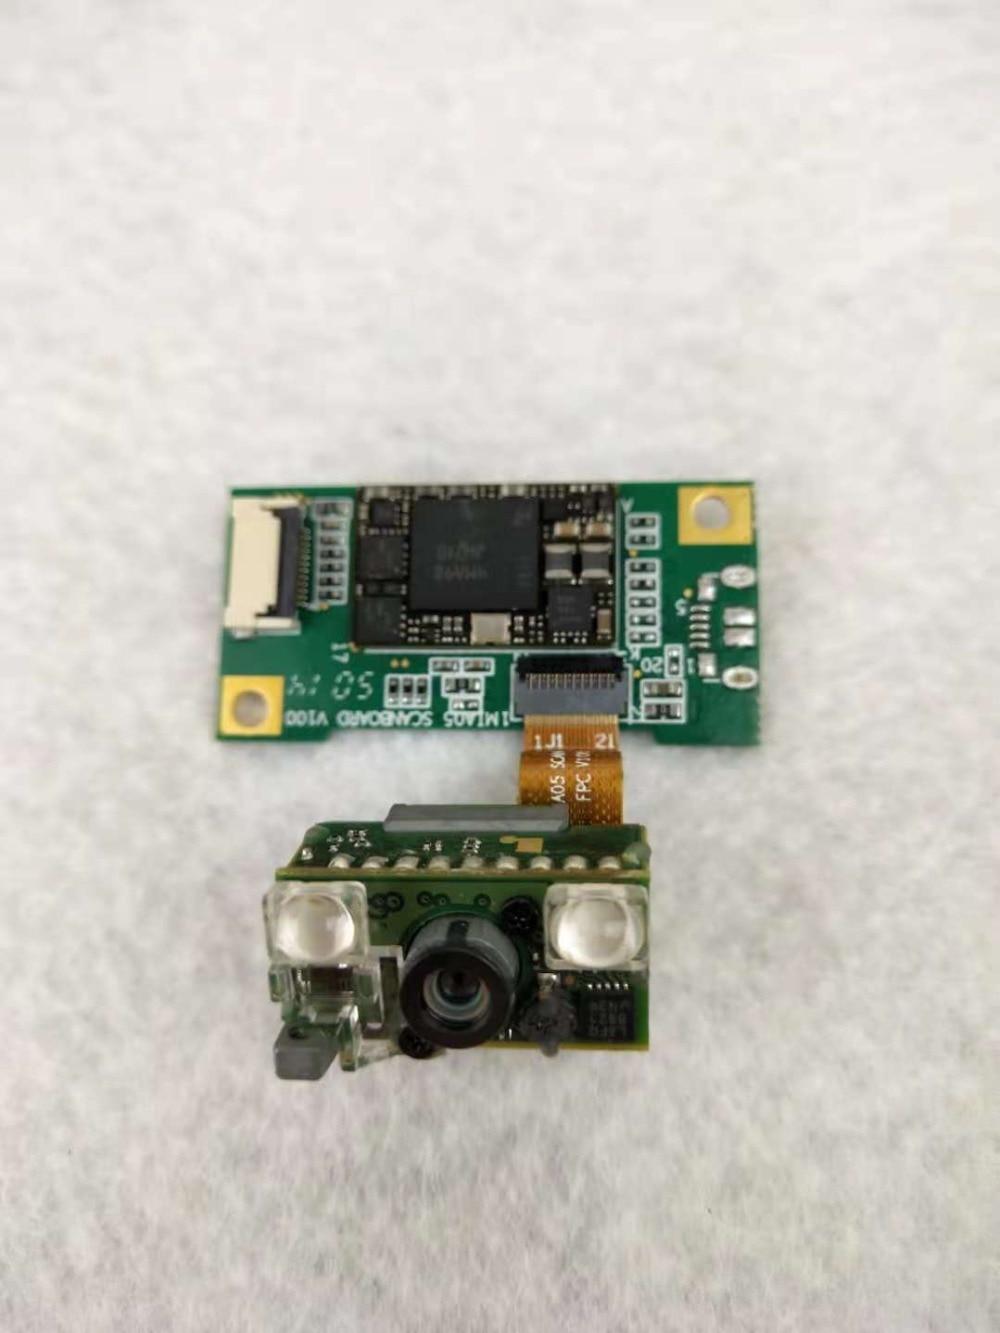 New Original SE4500 2D Scan Head Engine With Scanning Board For ZEBRA/SYMBOL for symbol mc3090 mc9097 mc5574 mc7094 2d scanning head se4400